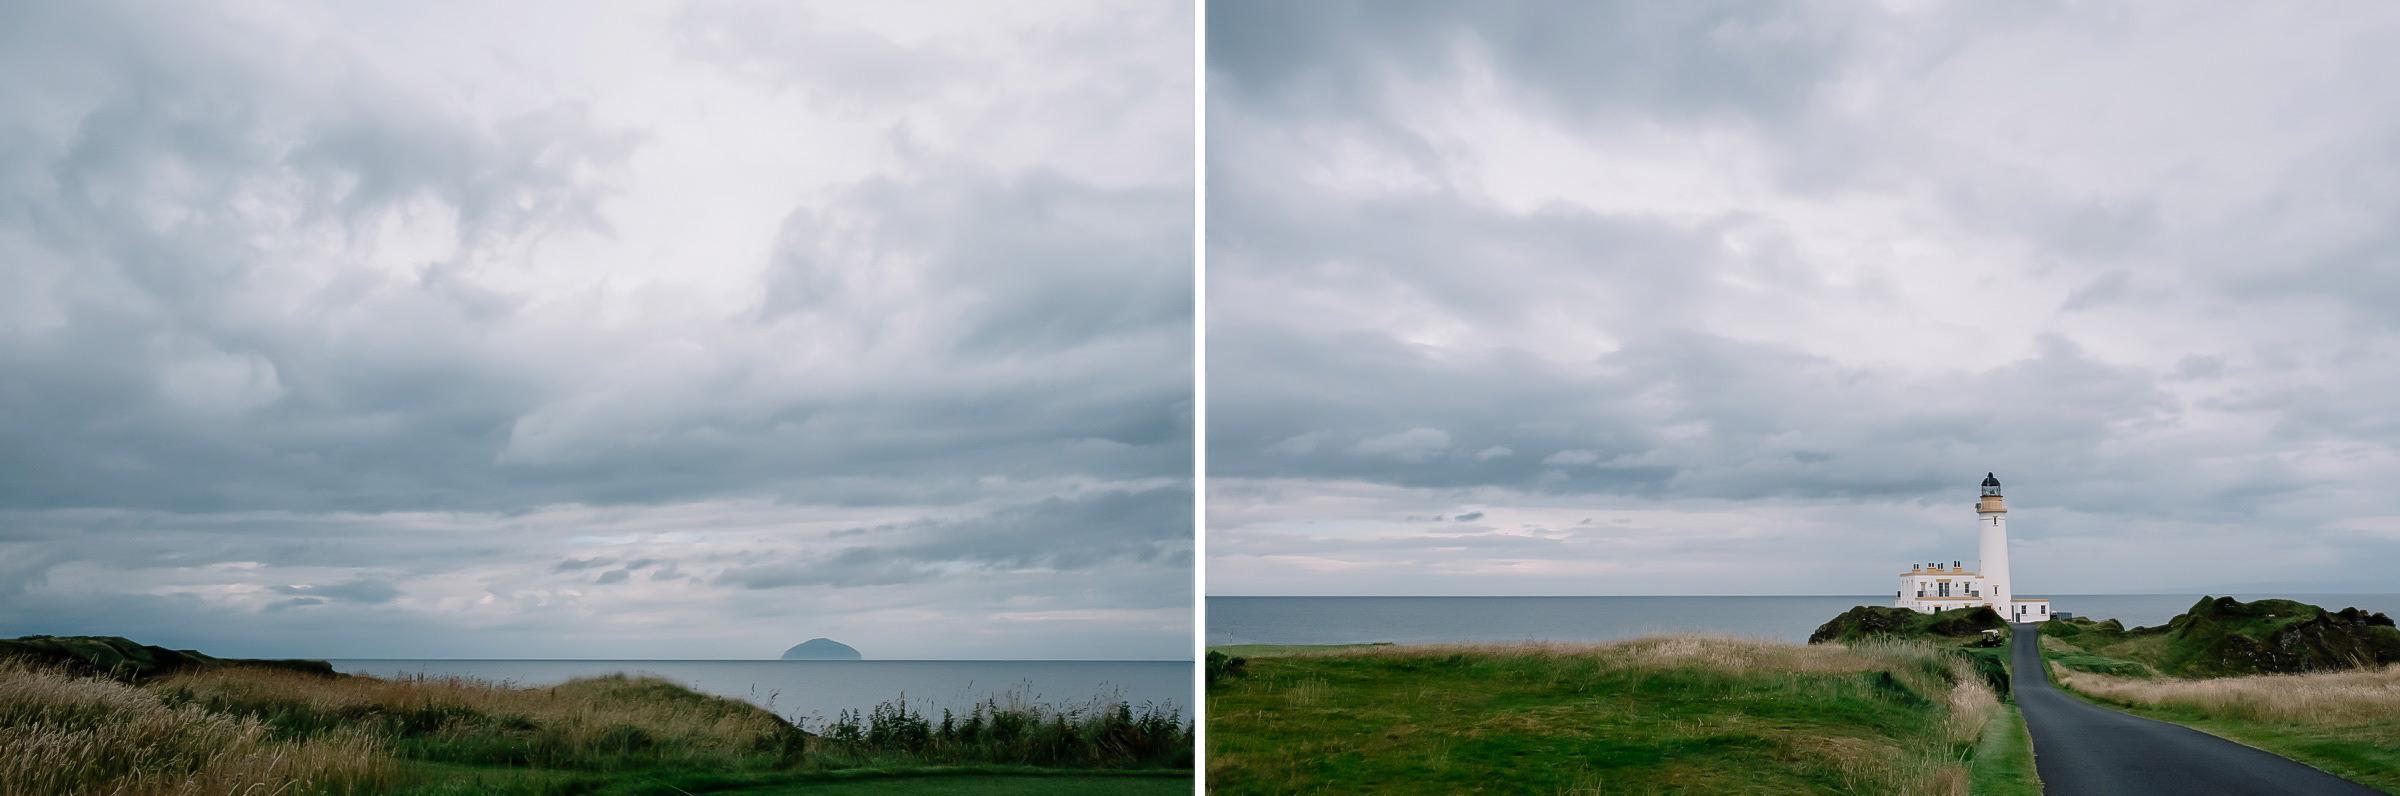 Scotland at sea